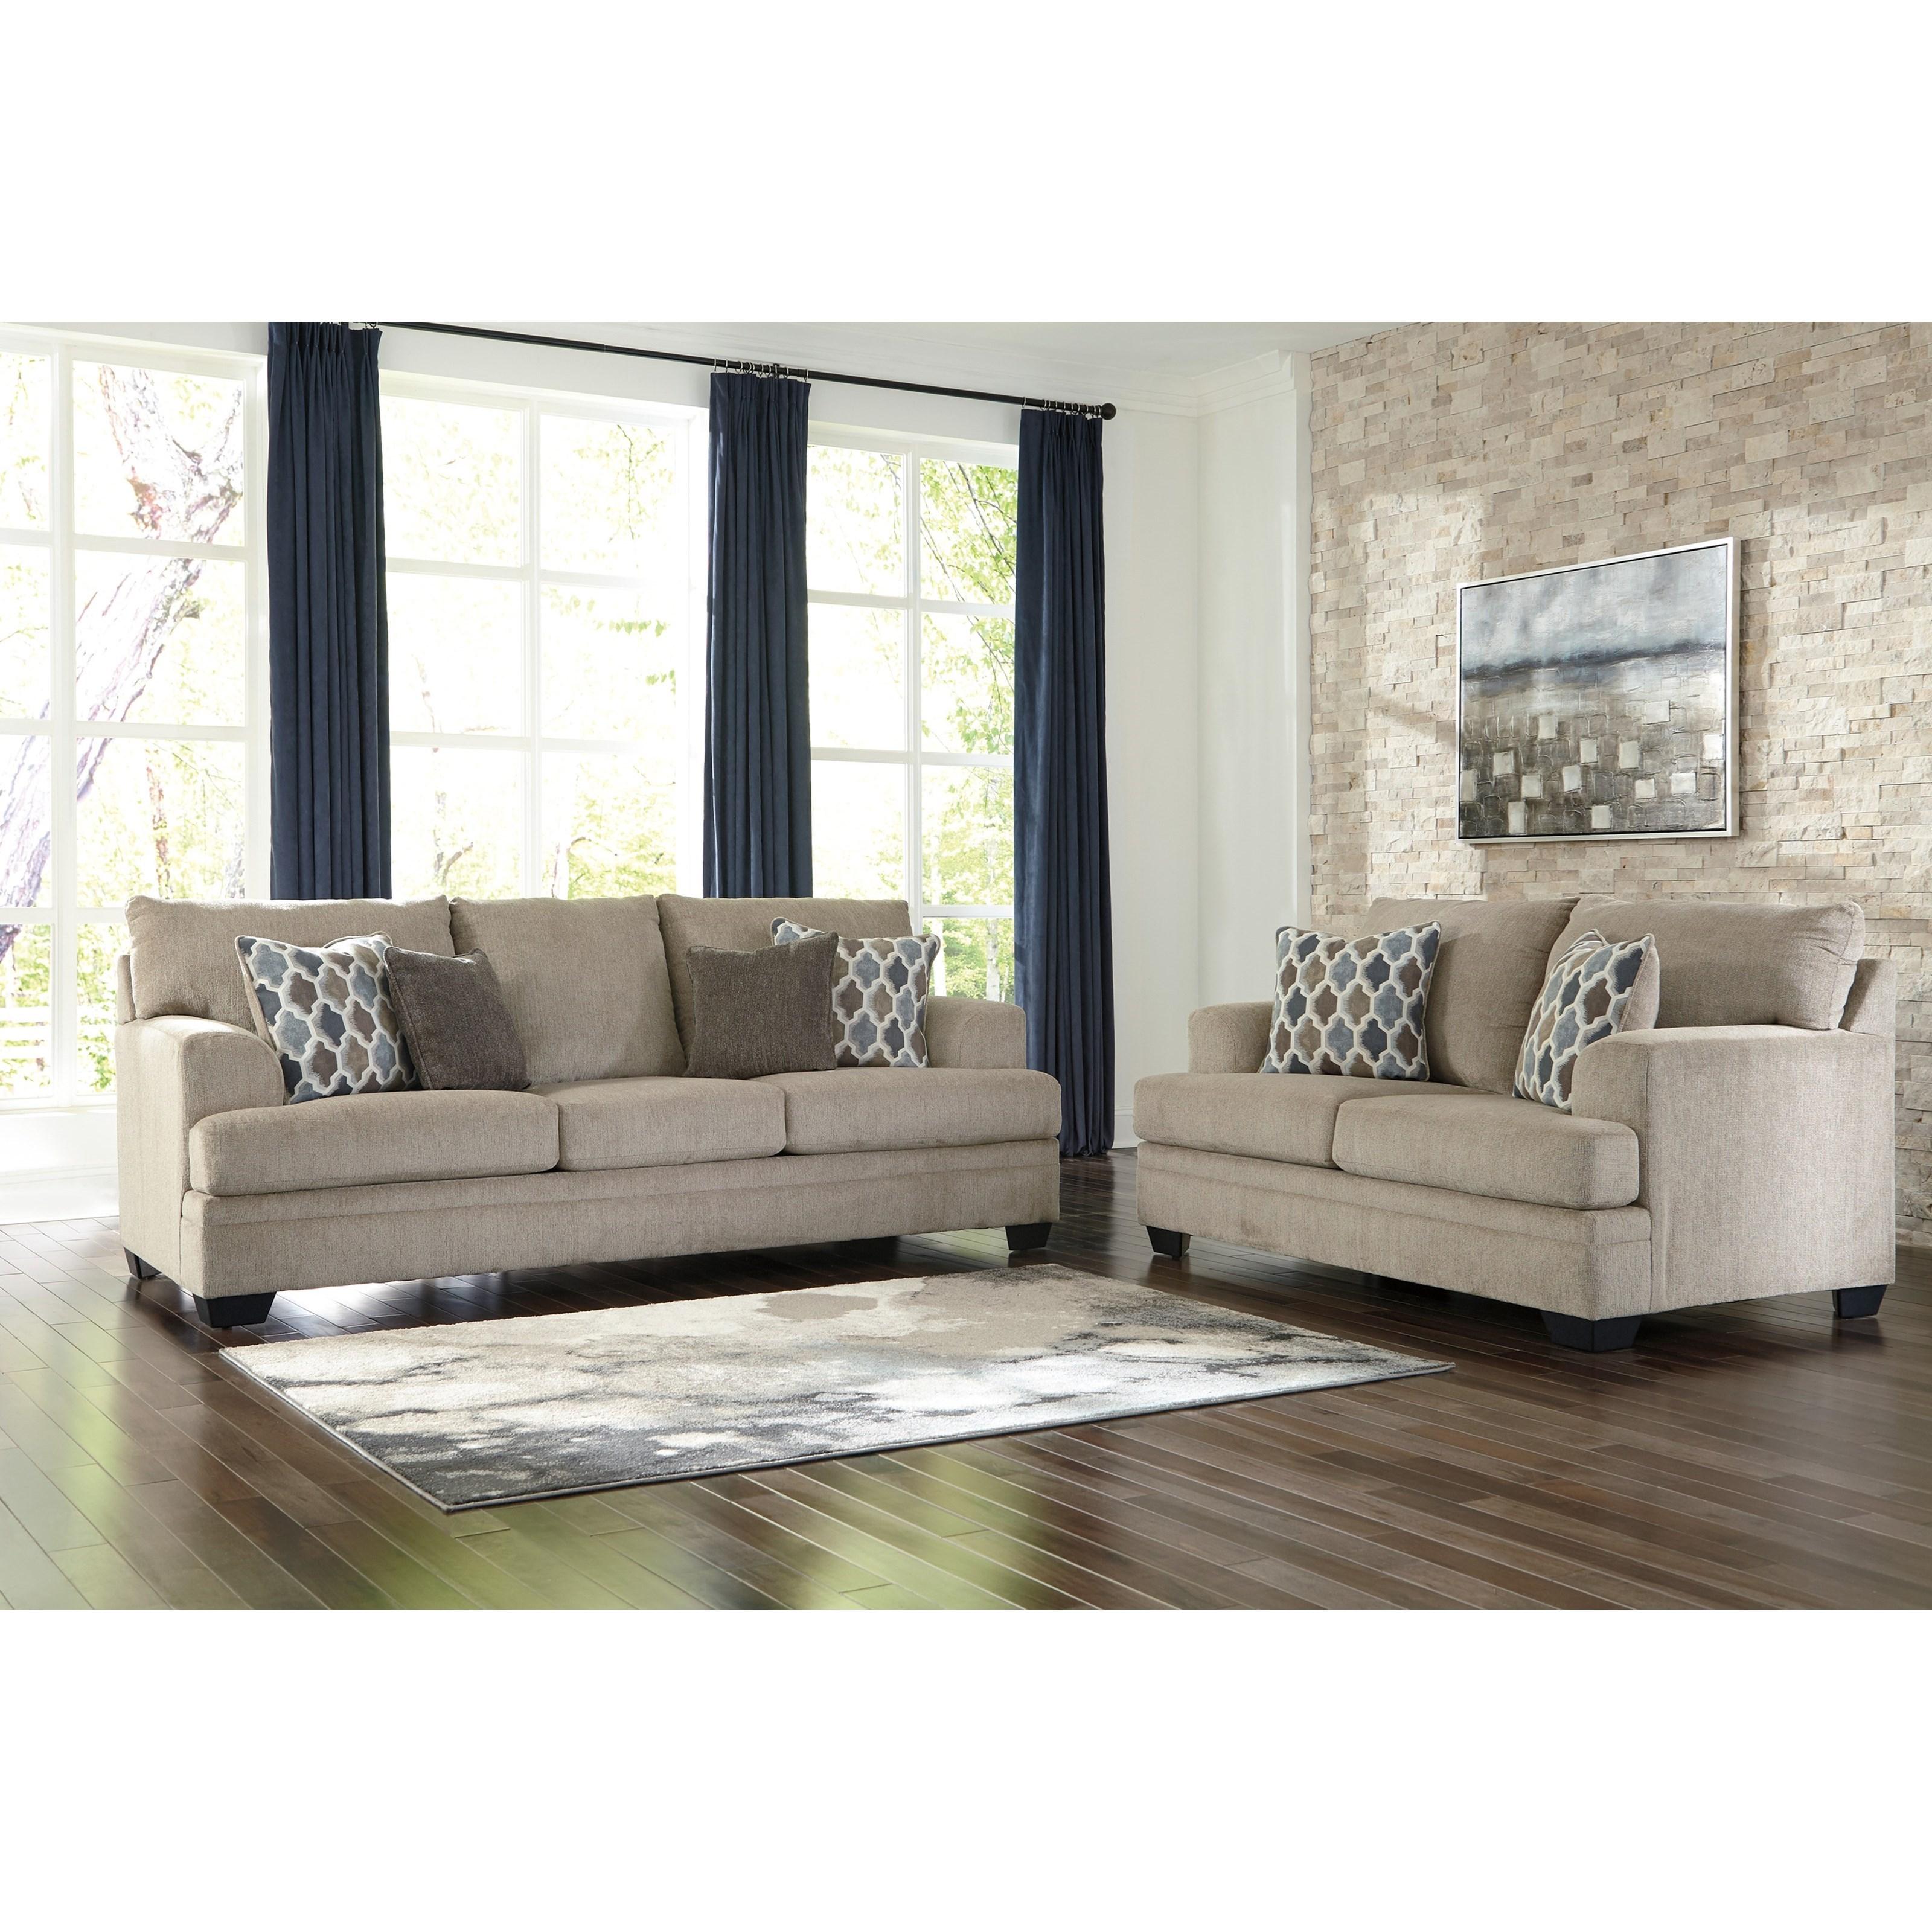 Ashley Furniture Calion Stationary Living Room Group: Ashley Signature Design Dorsten Stationary Living Room